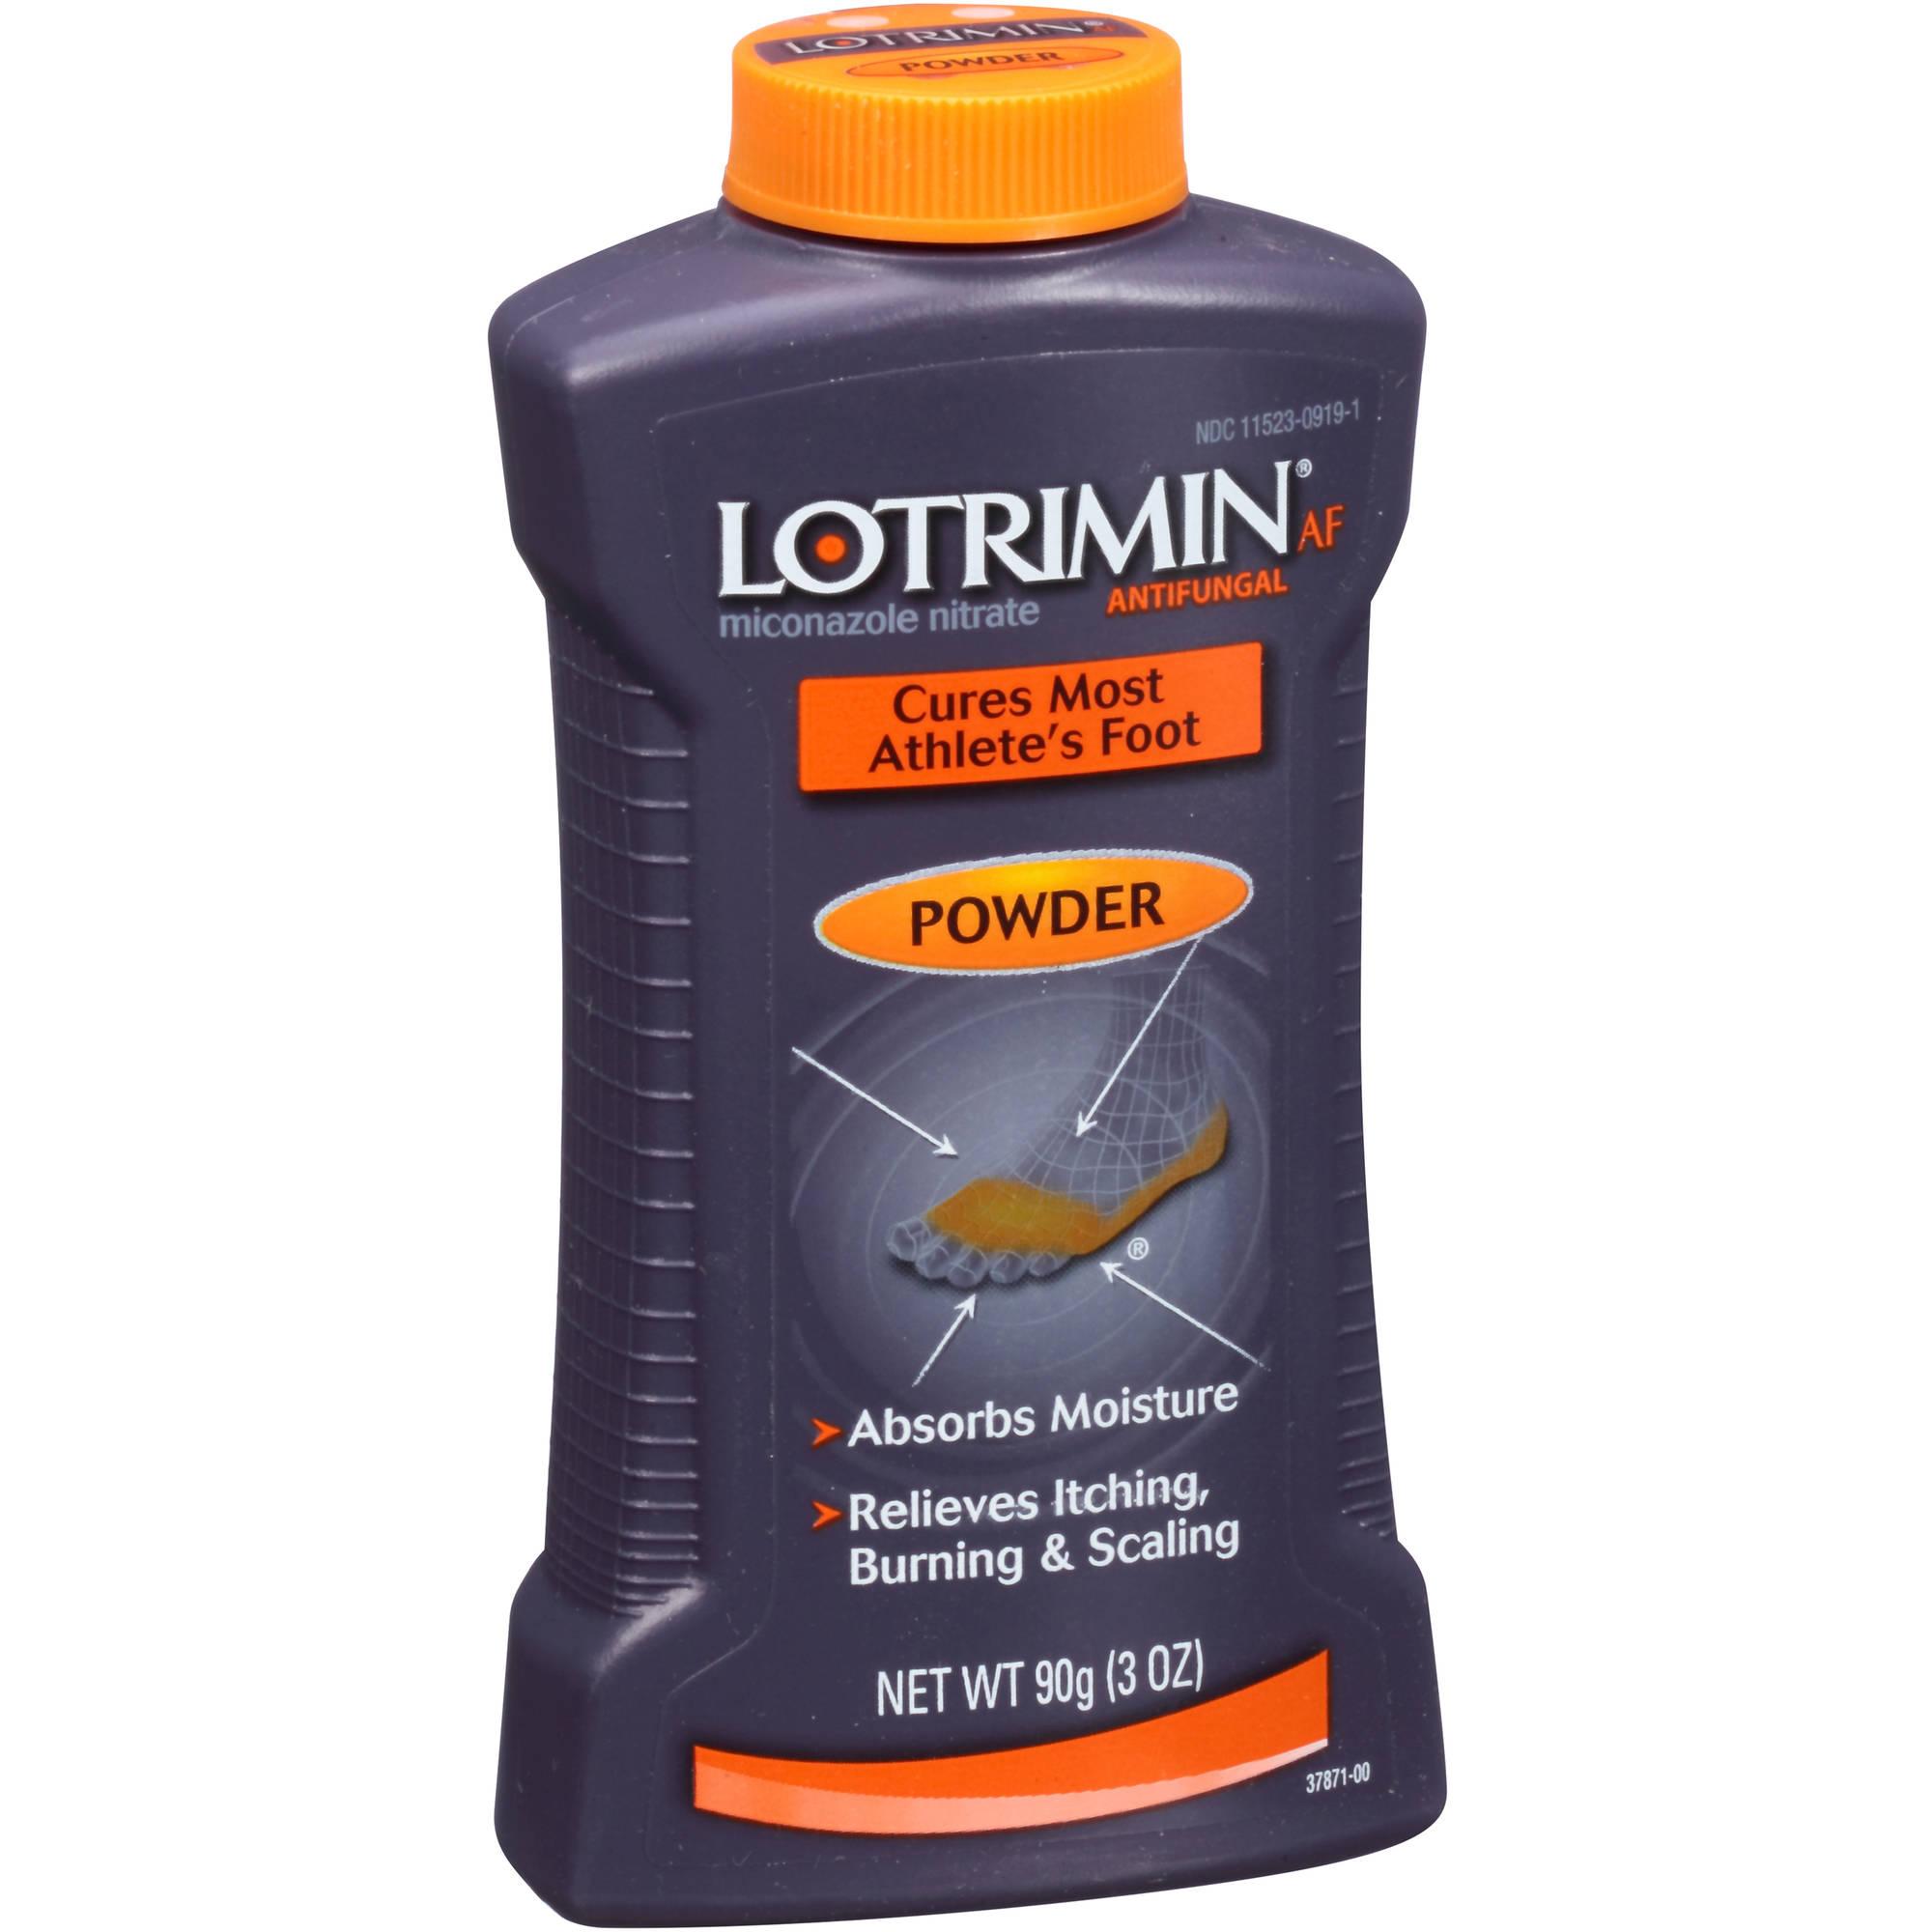 Lotrimin AF Miconazole Nitrate Antifungal Powder, 3 oz